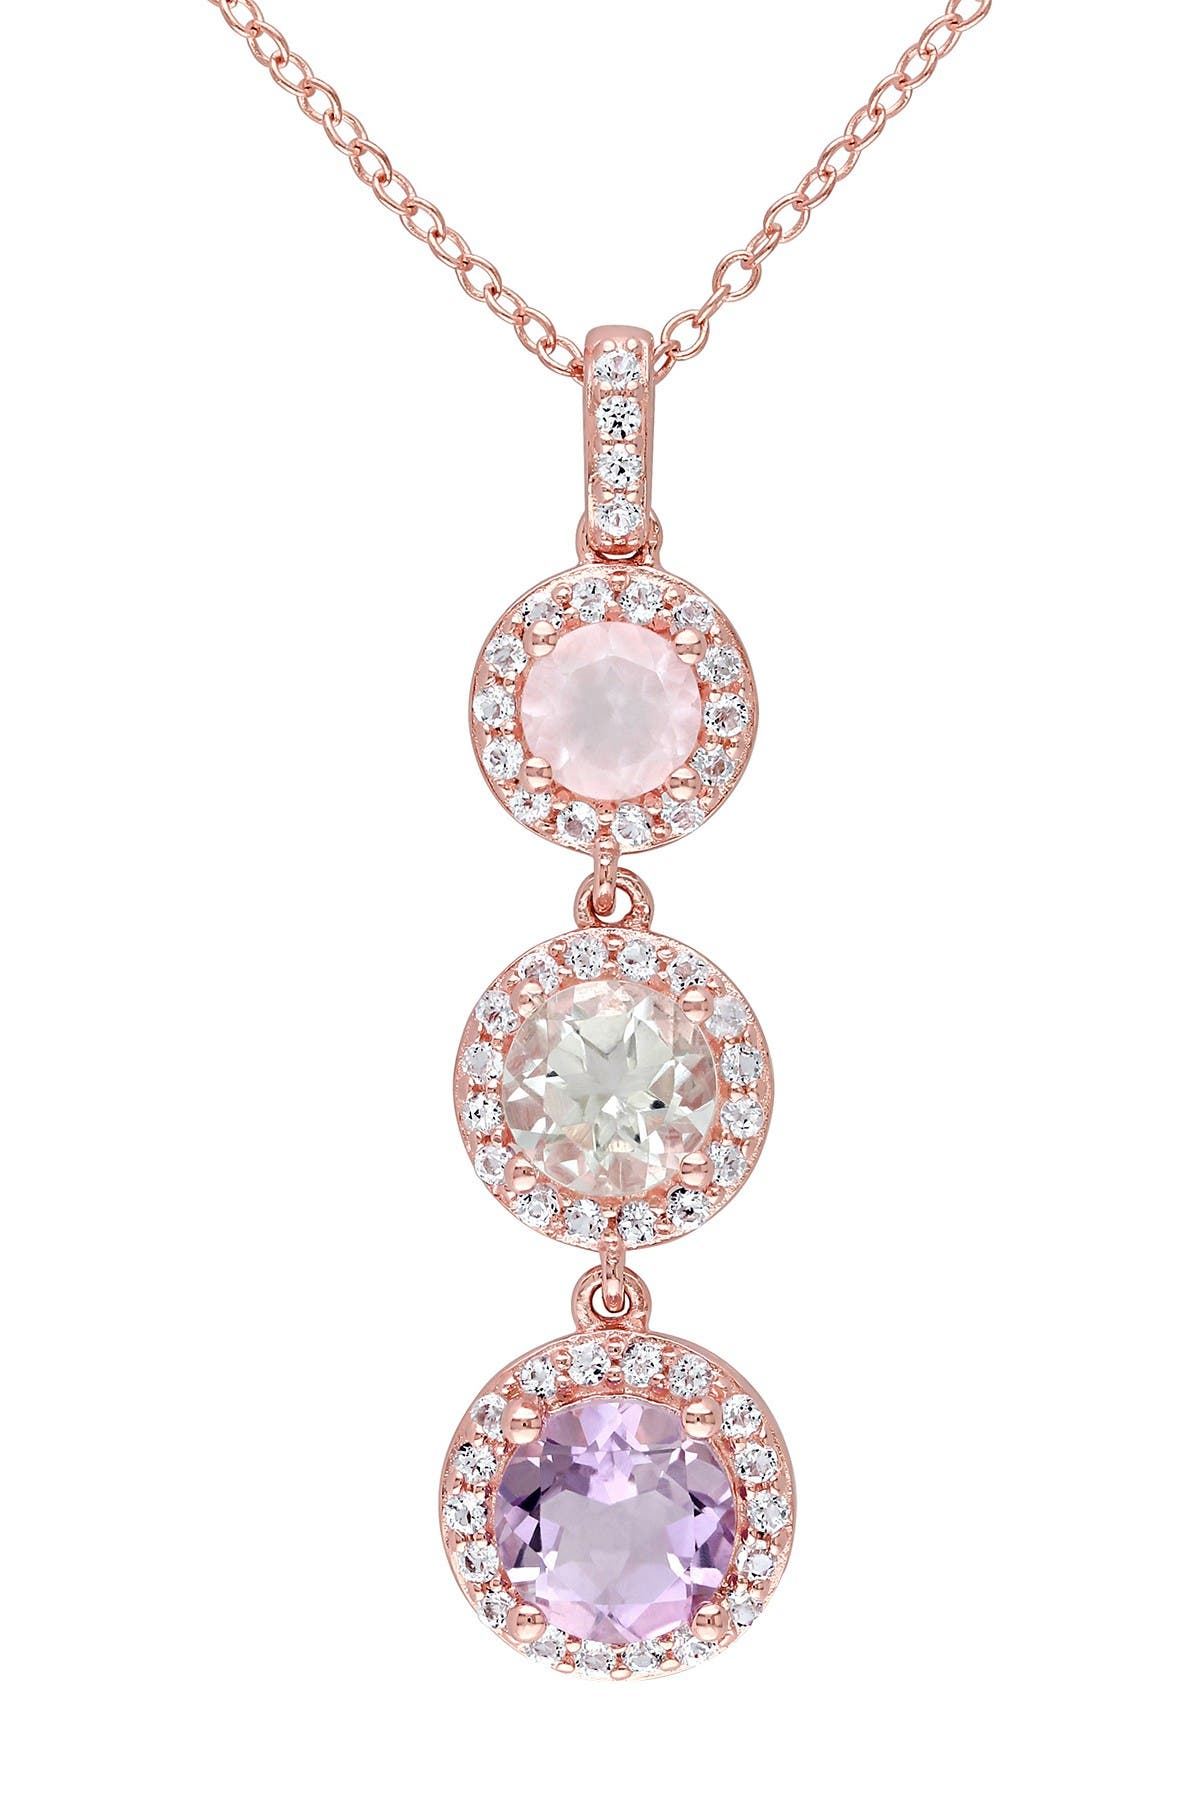 Image of Delmar Rose Quartz, Green Amethyst, & Rose de France Triple Drop Pendant Necklace